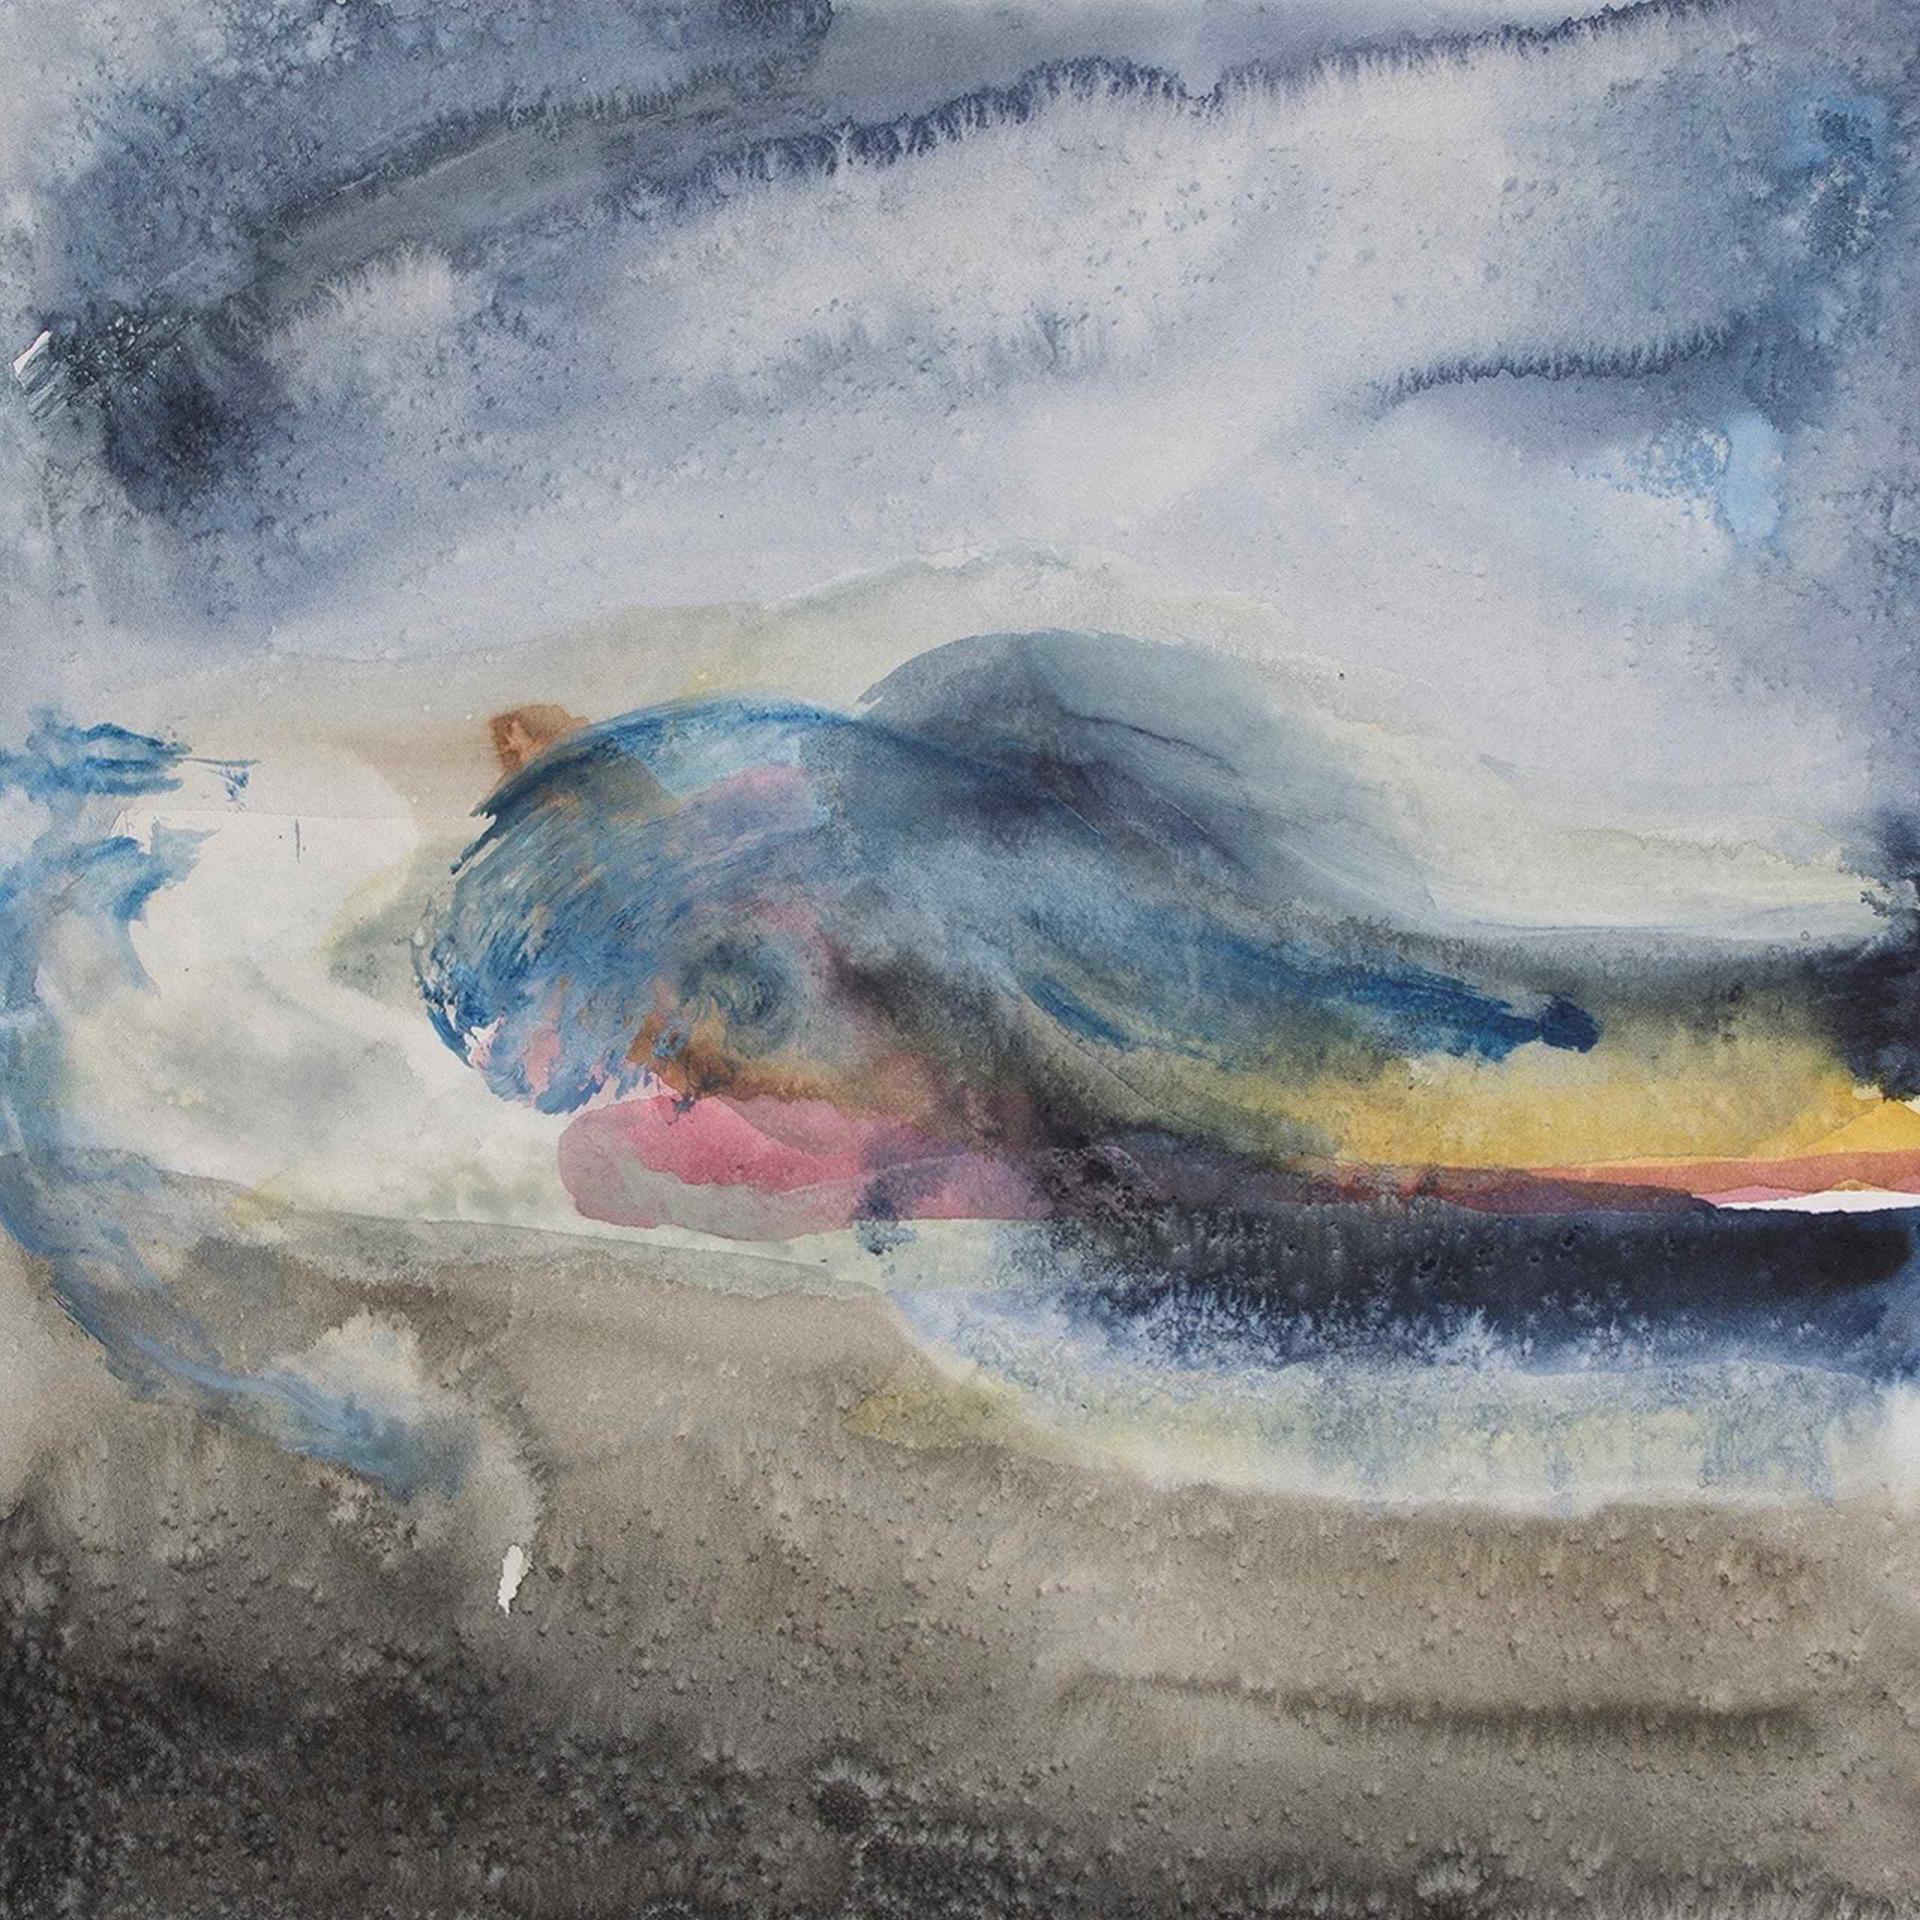 Juist 6 - Aquarell von Eva Doelker-Heim